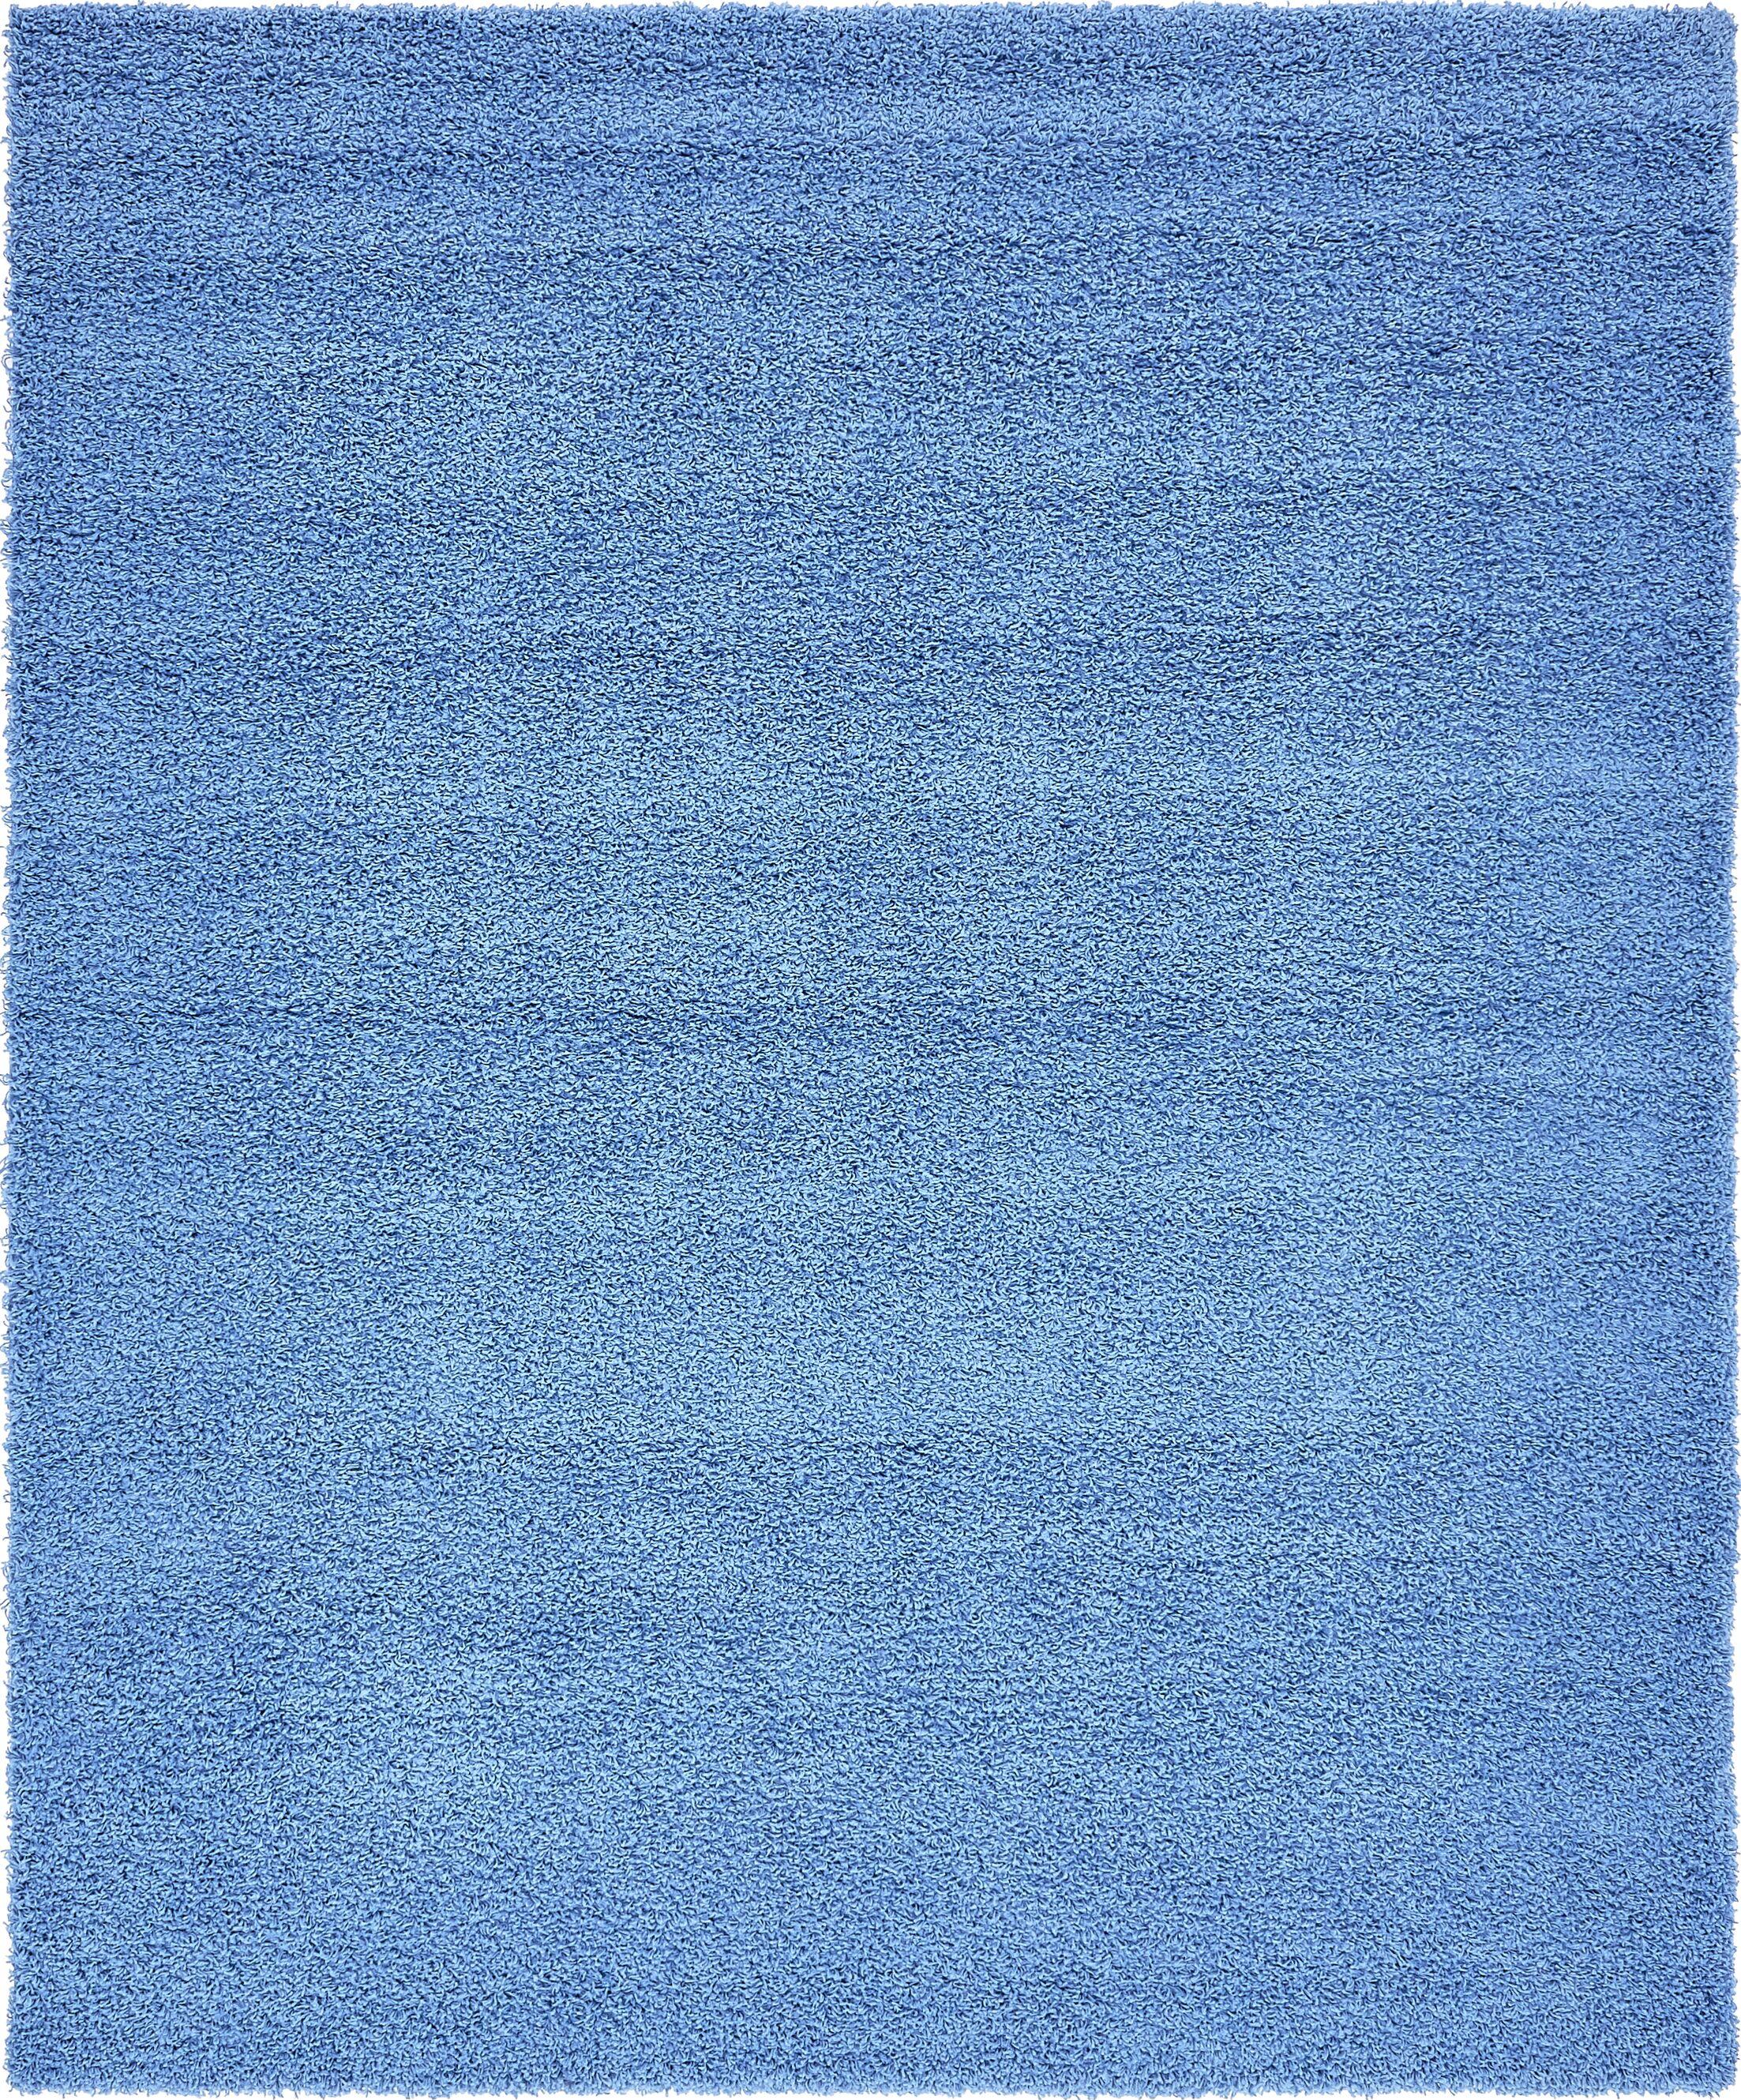 Madison Periwinkle Blue Area Rug Rug Size: Rectangle 8' x 10'